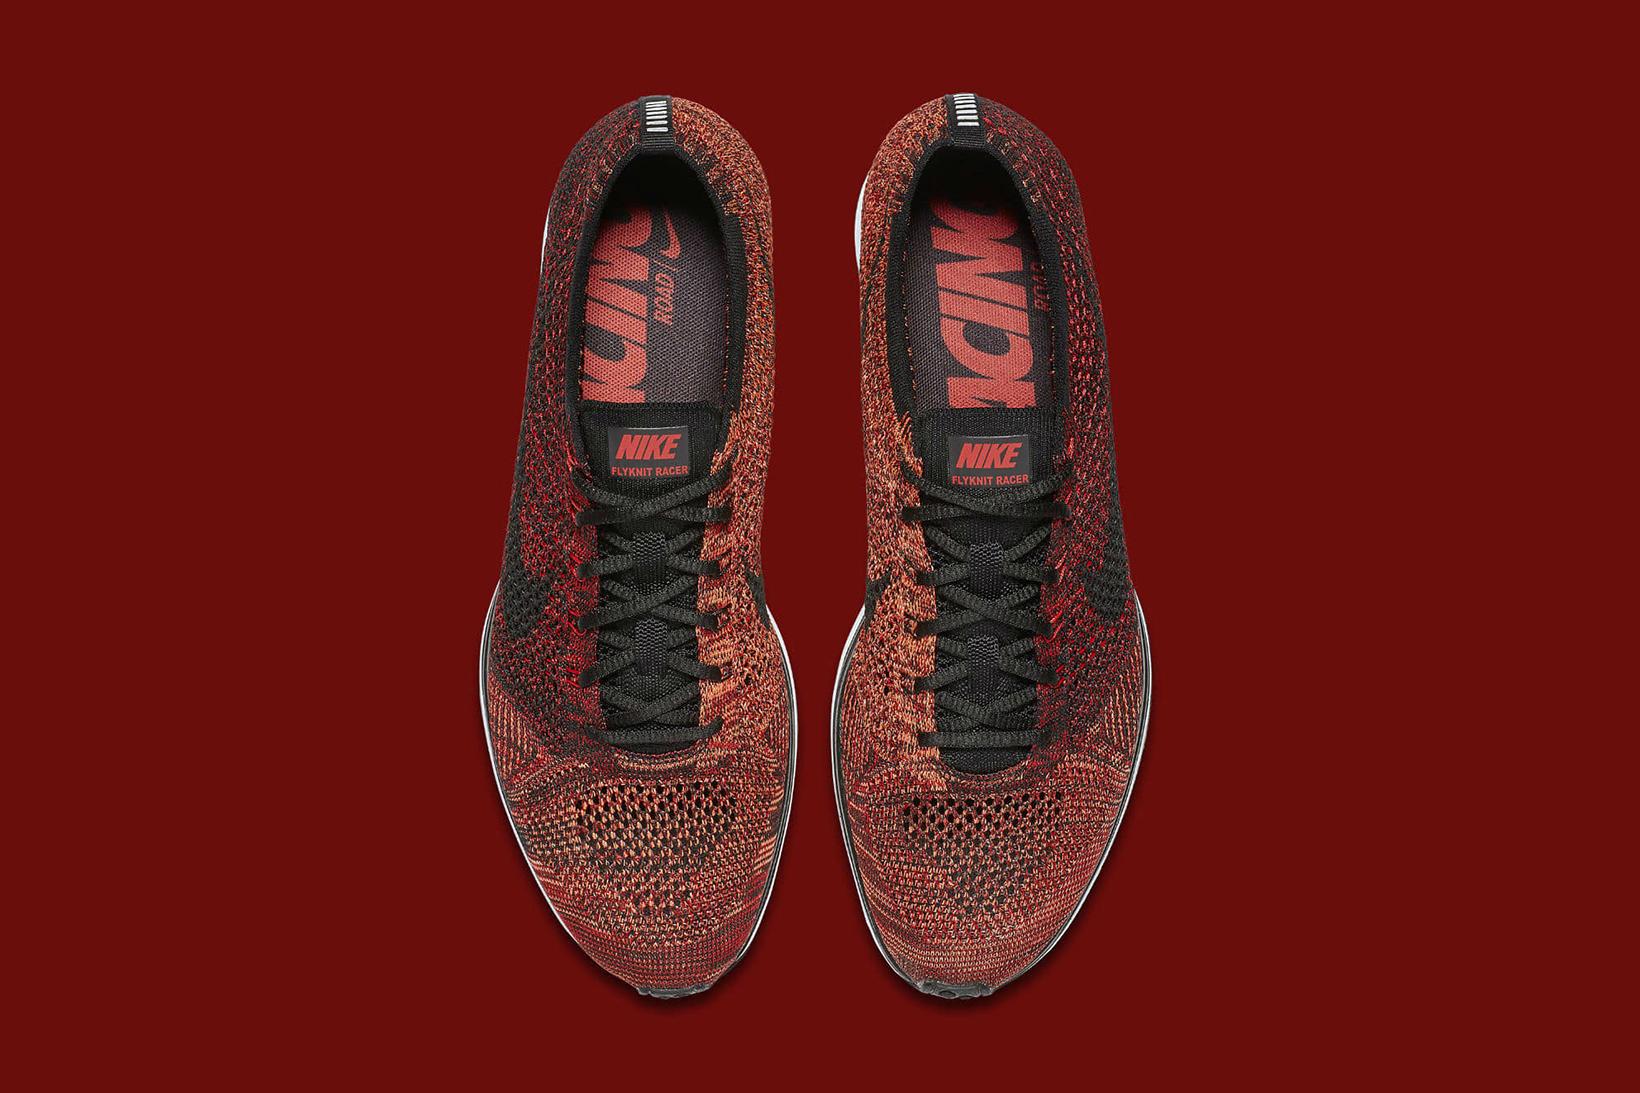 Nike Flyknit Racer University Red Black Bright Mango